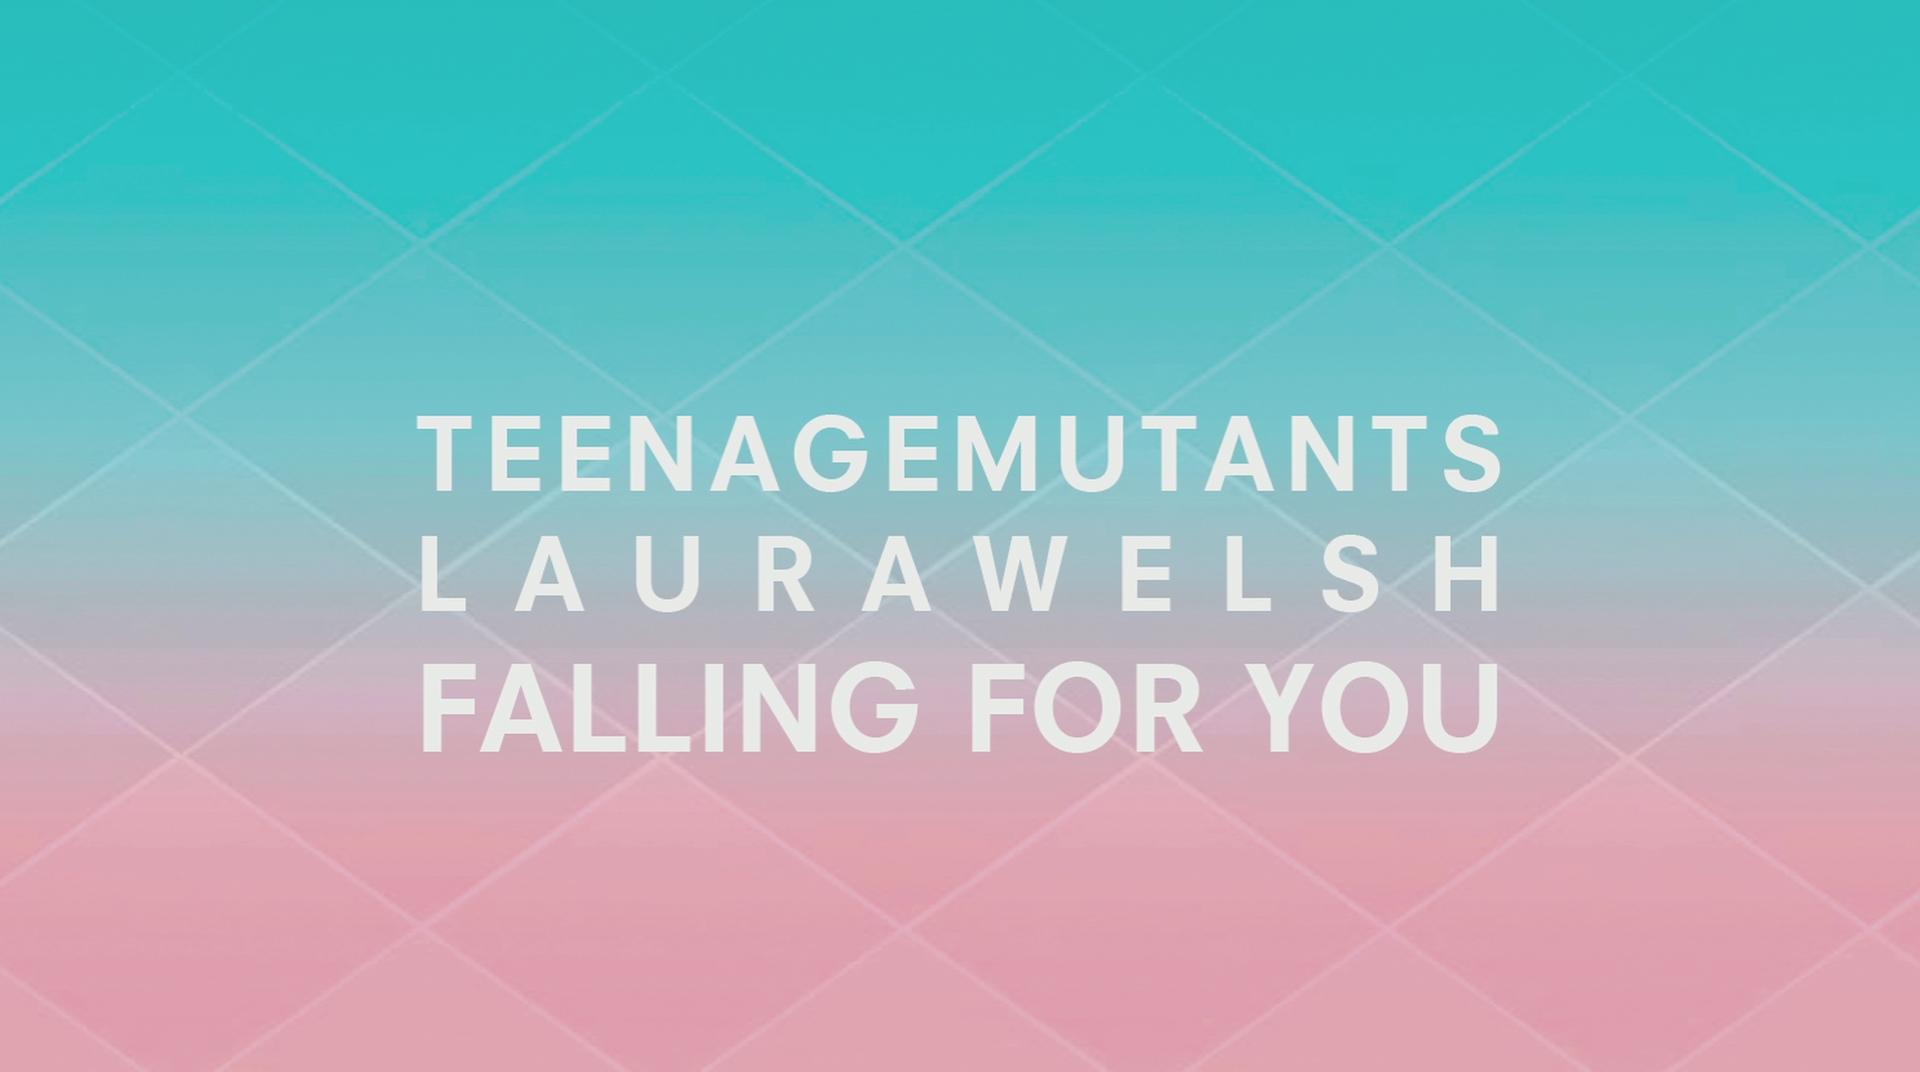 Teenage Mutants & Laura Welsh – Falling For You